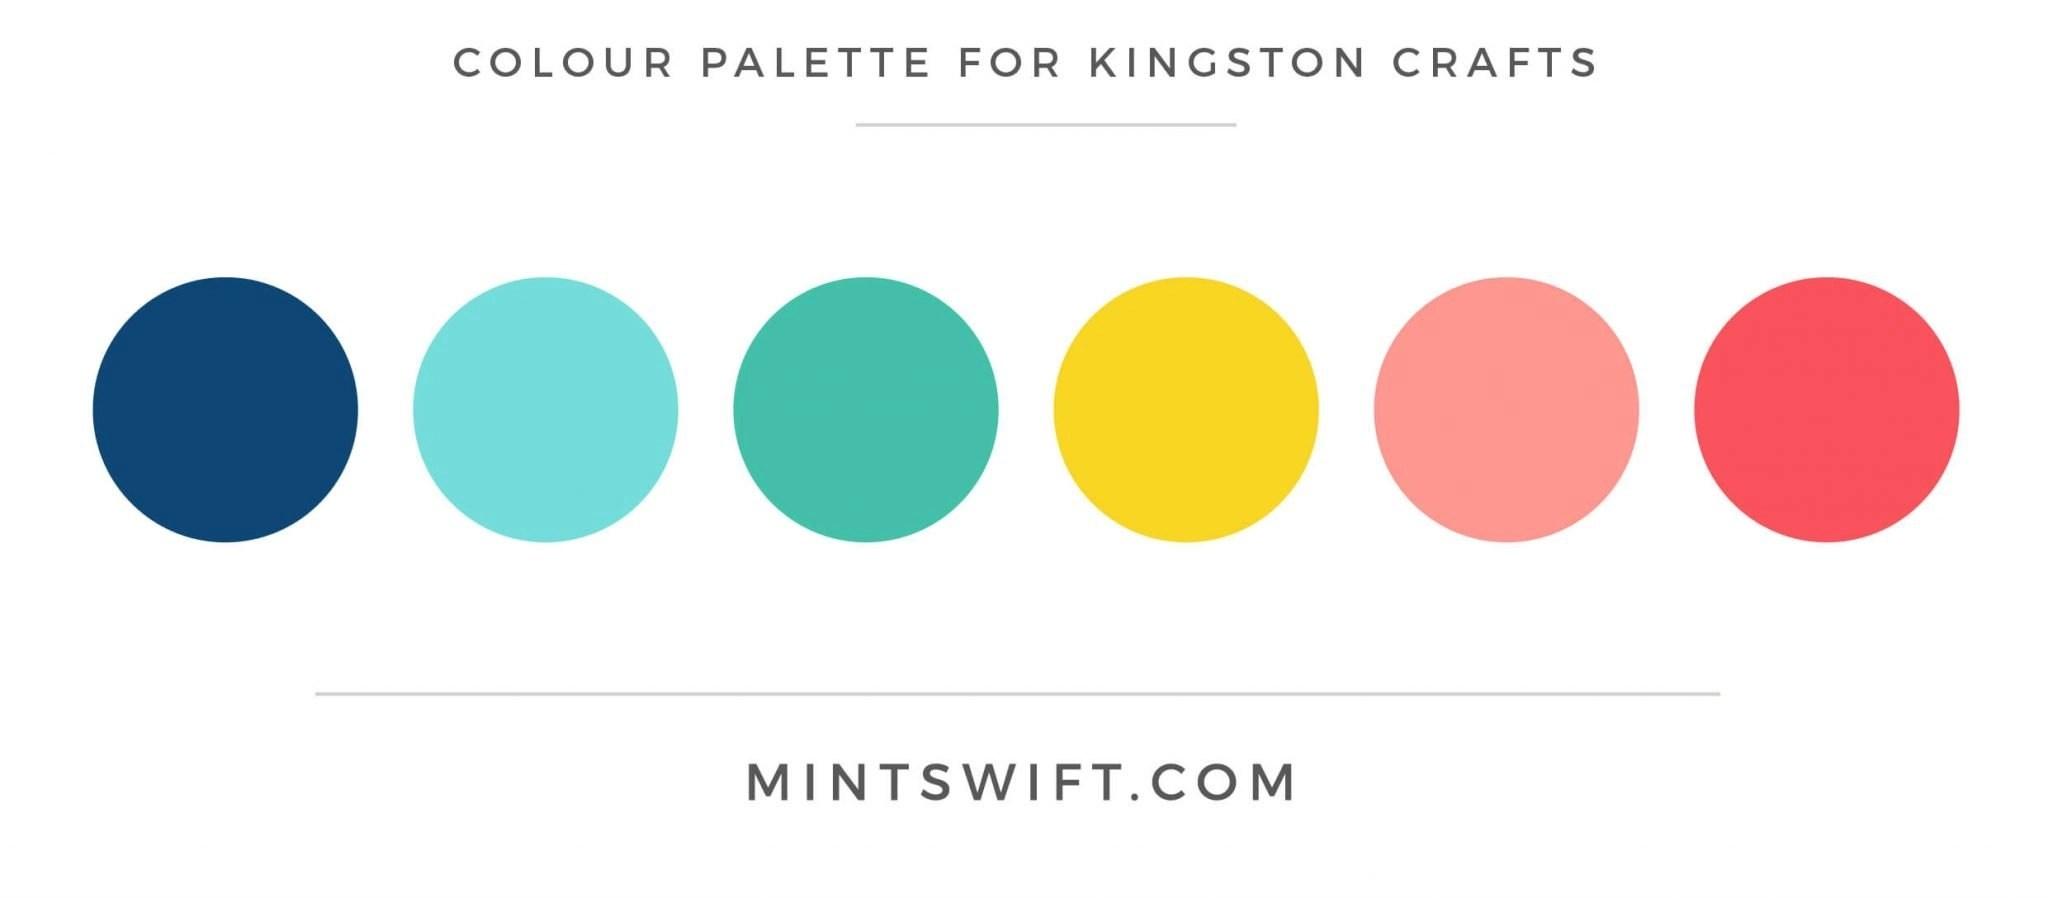 Kingston Crafts - Colour Palette - Brand Design Package - MintSwift